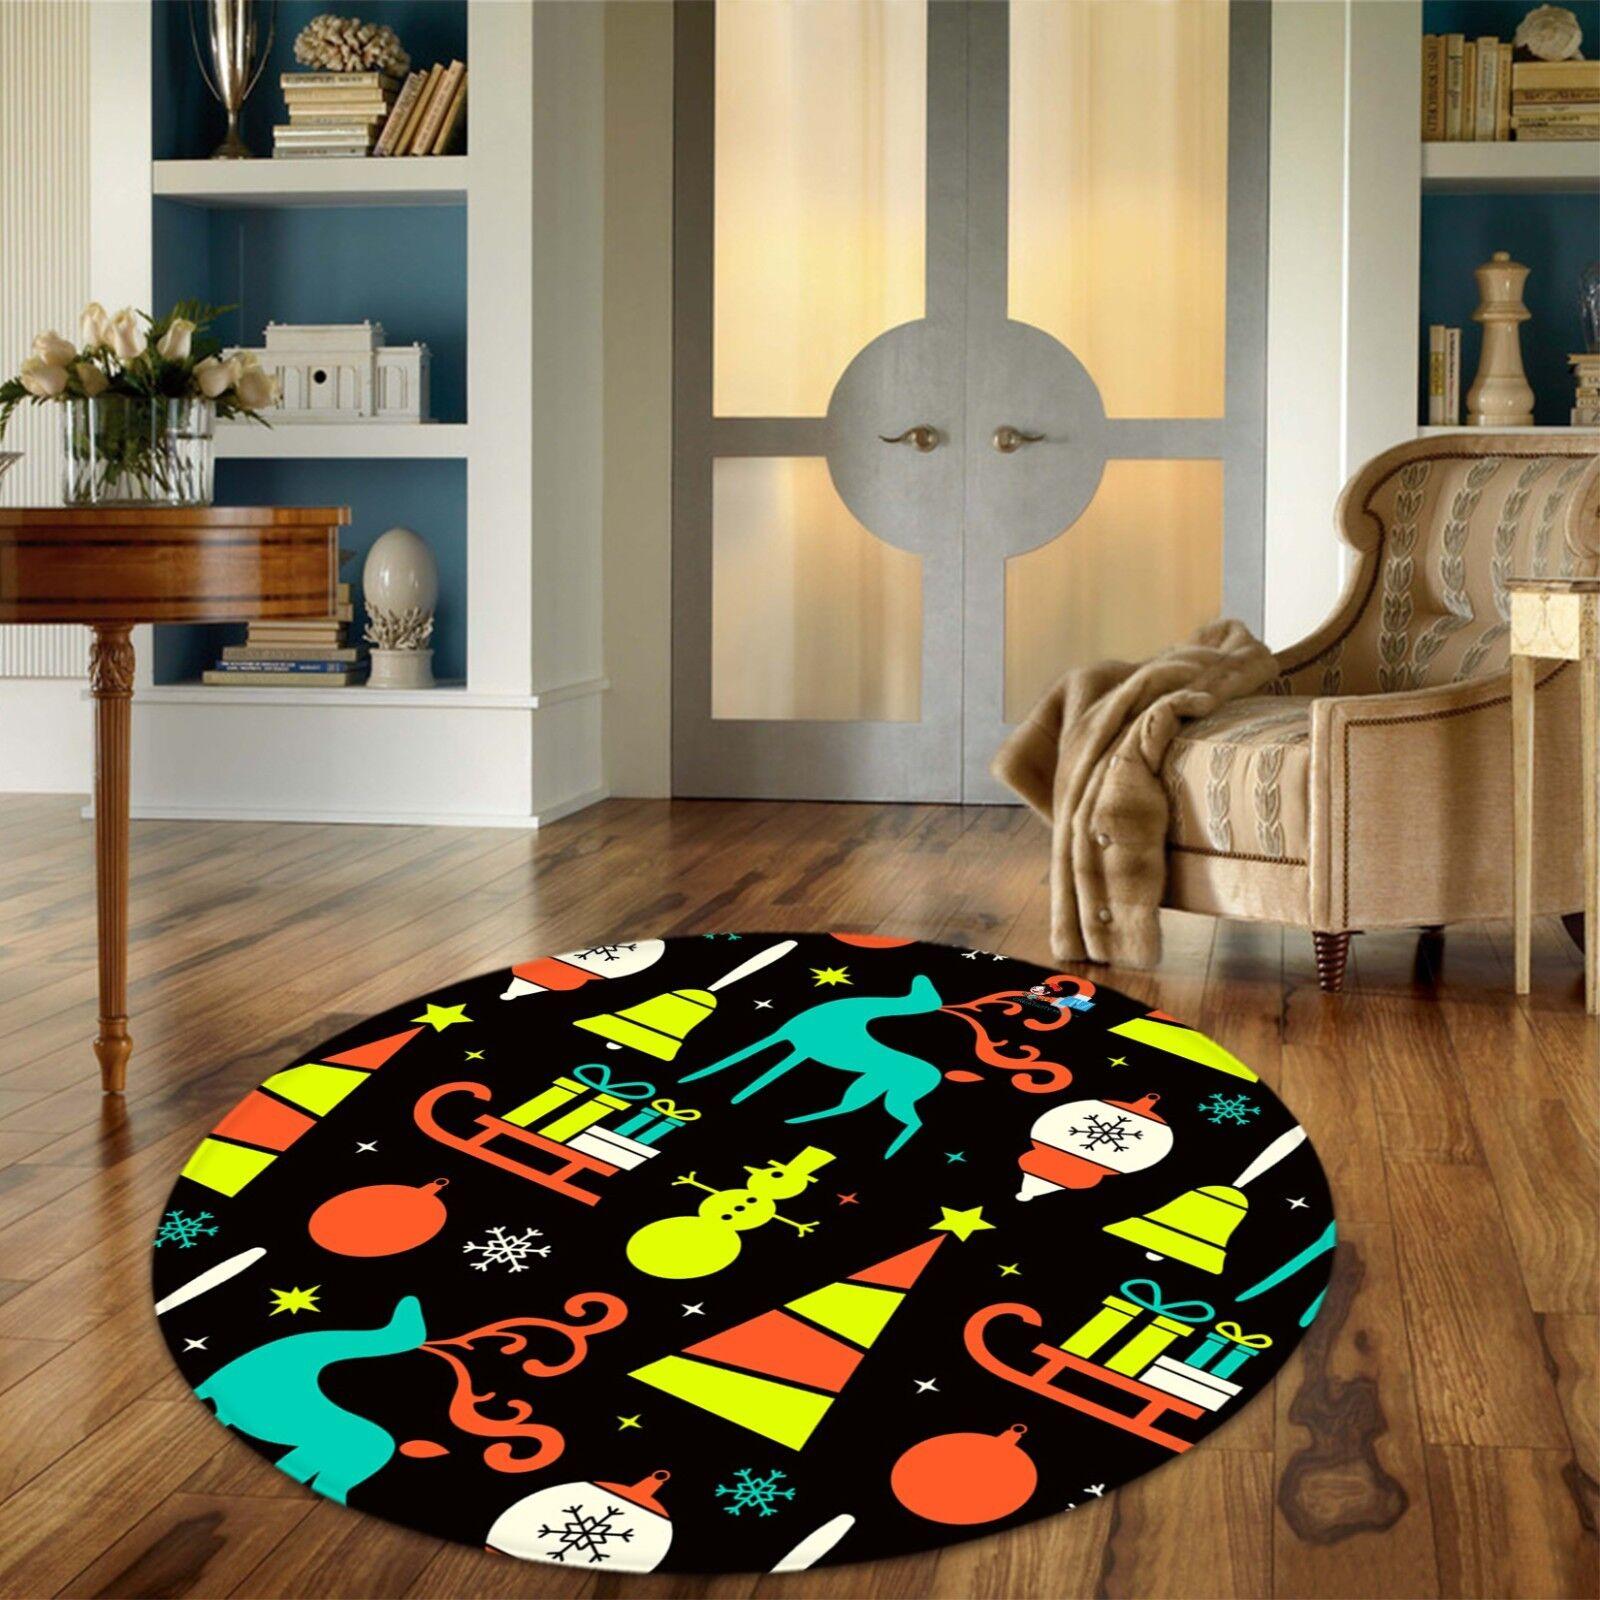 3D Christmas  Xmas Xmas Xmas 504 Non Slip Rug Mat Room Mat Round Elegant Photo Carpet AU eacdd0